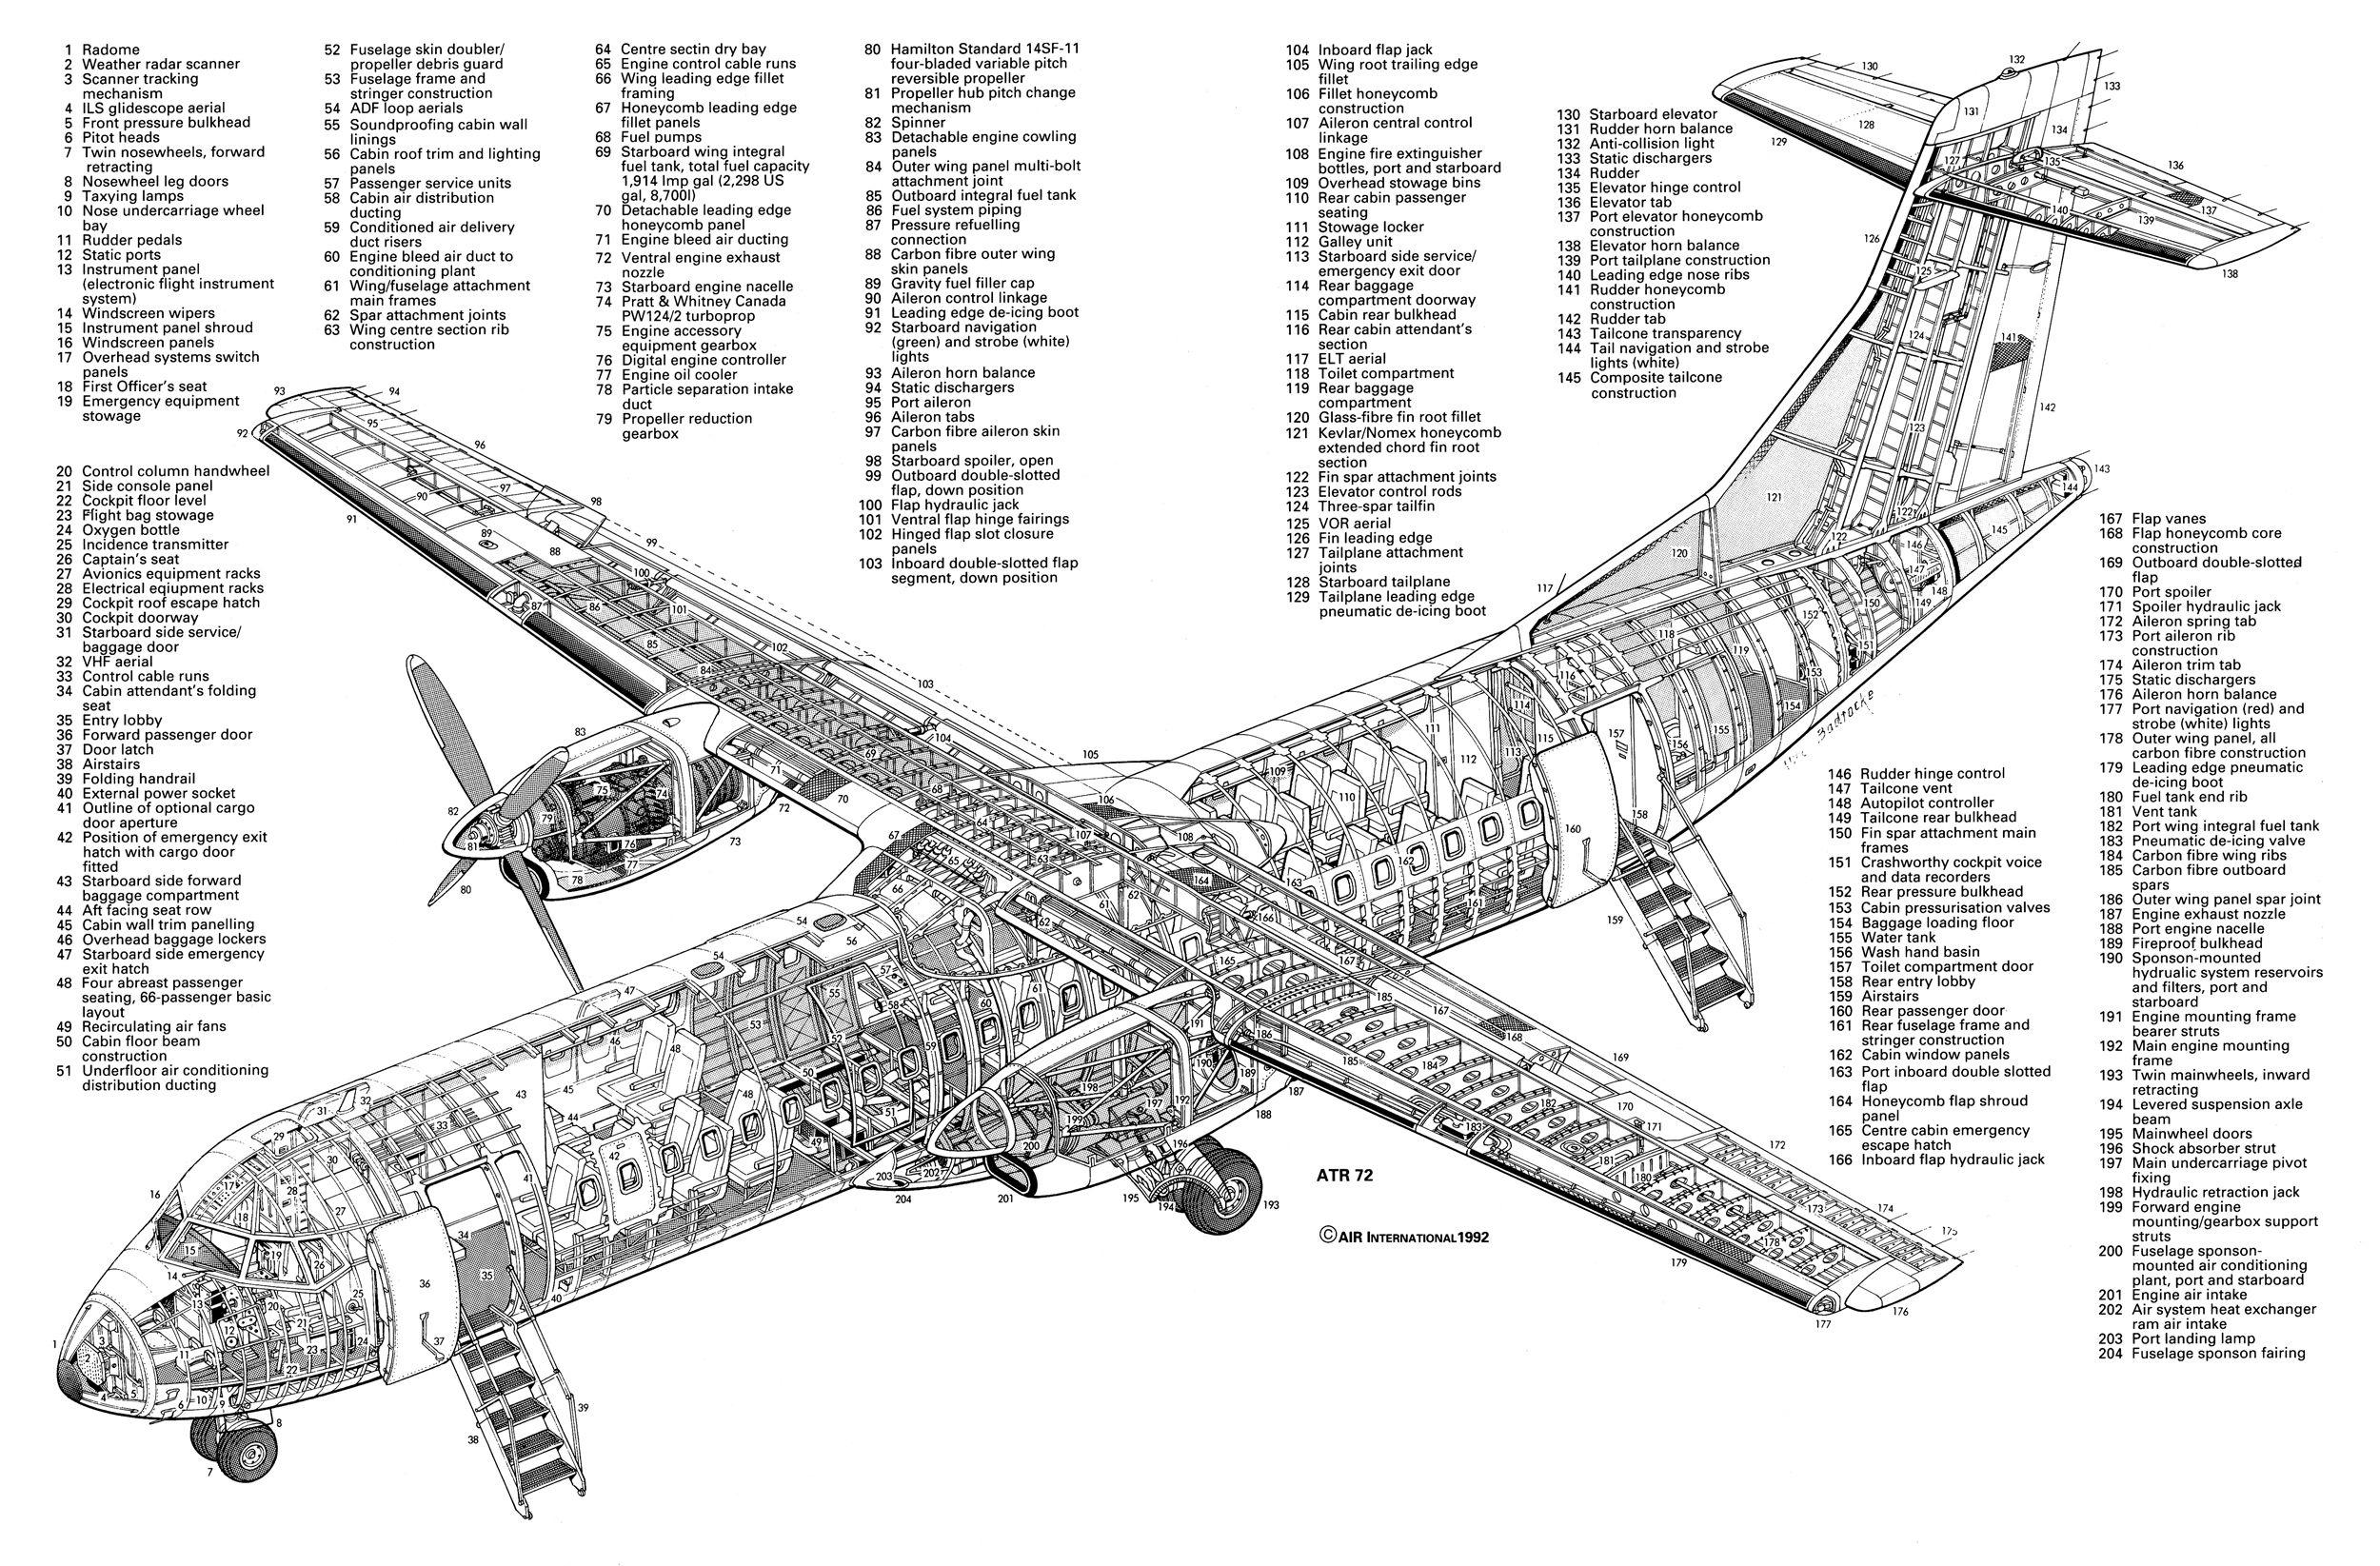 Atr 72 And Other Cutaways